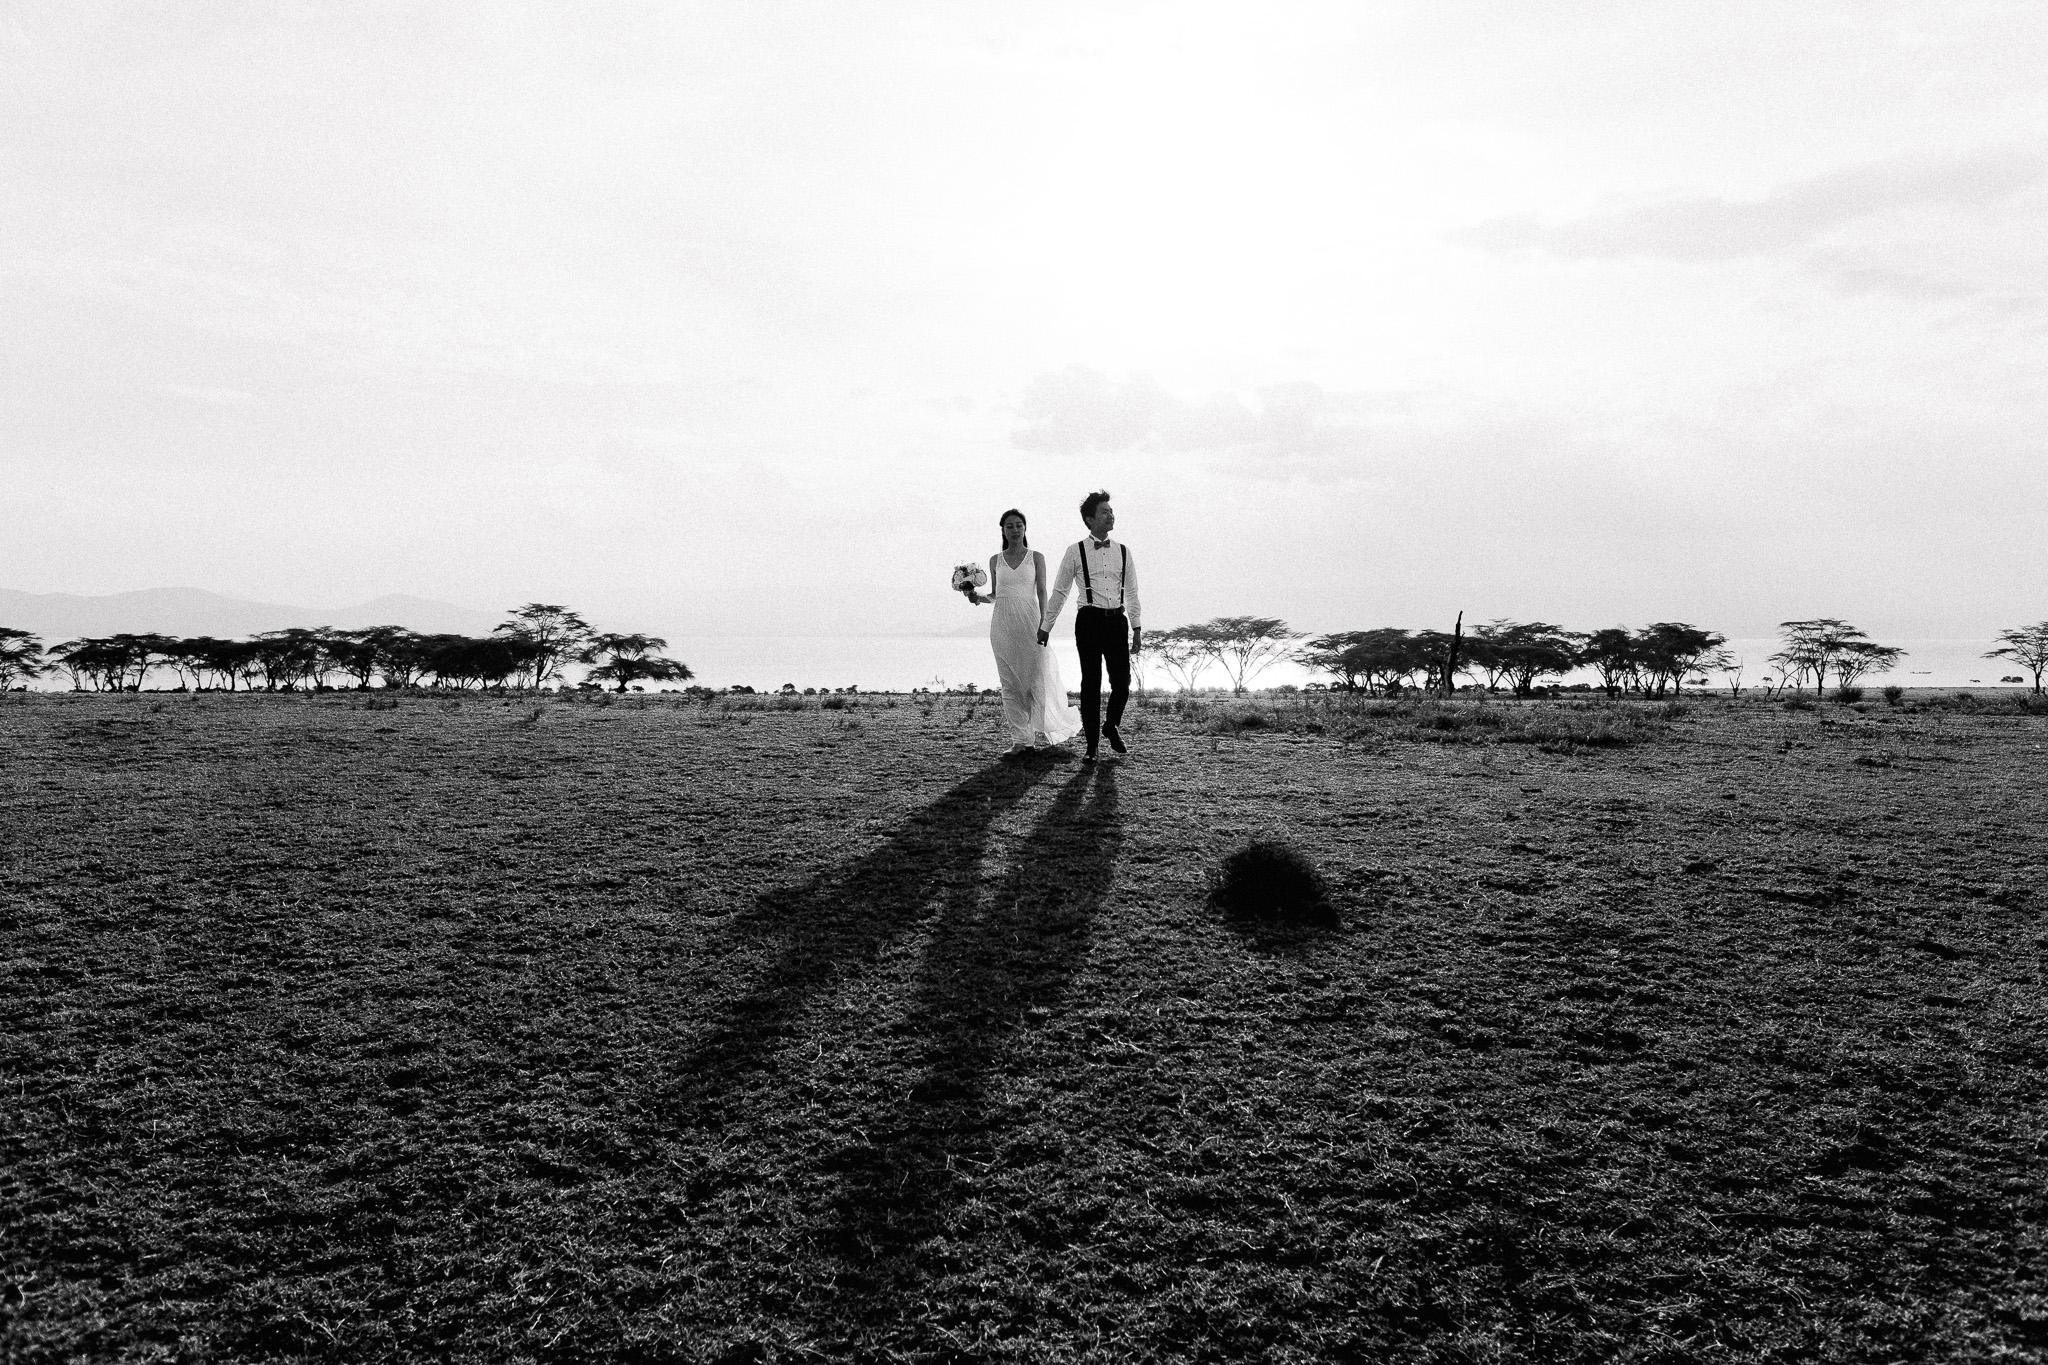 Anna-Hari-Photography-Safari-Elopement-Kenya-Wedding-Photographer-Kenya-74.jpg